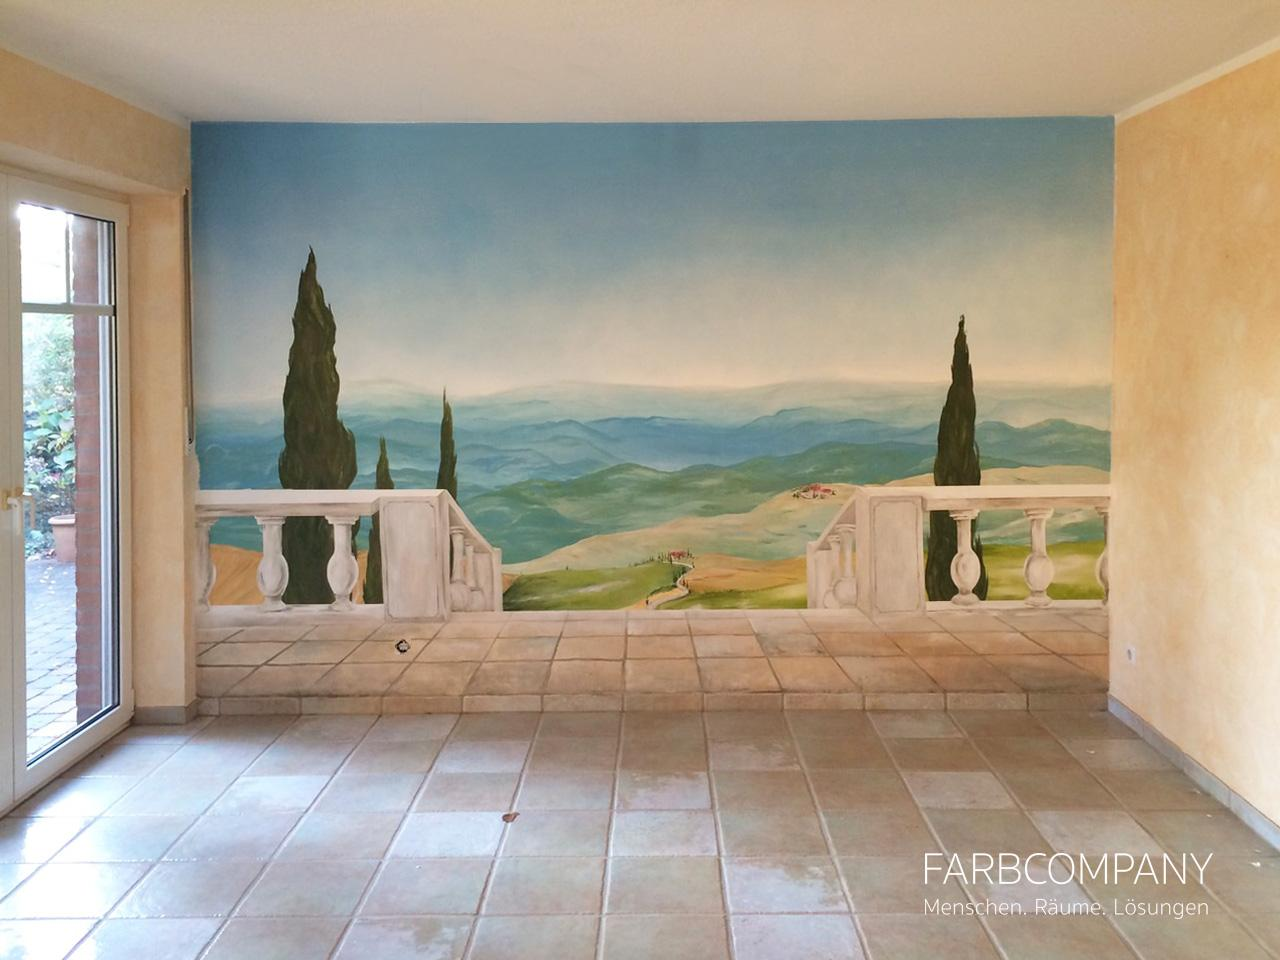 Wandmalerei bilder ideen couchstyle for Wandmalerei ideen